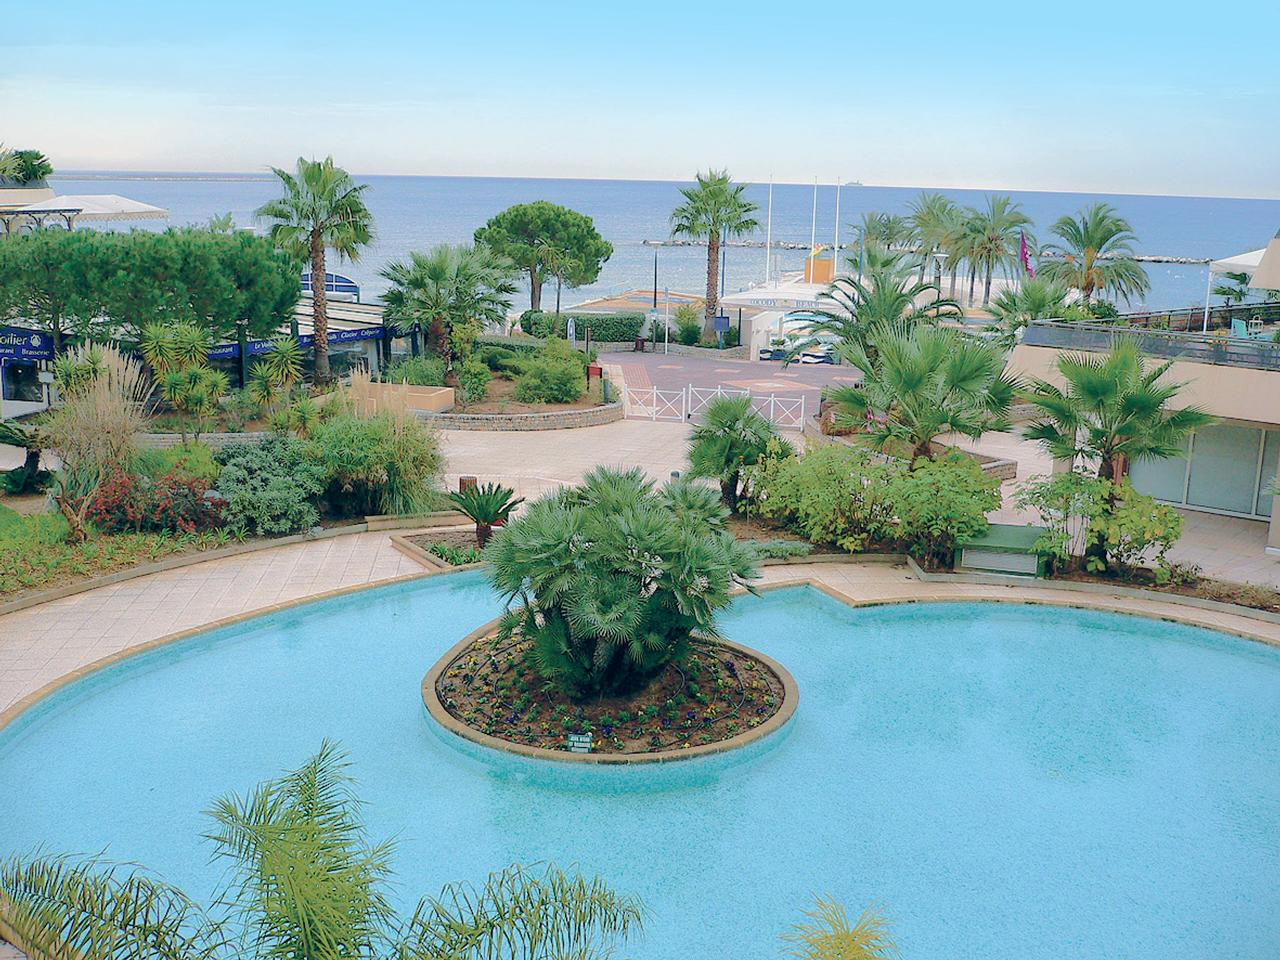 Immobilier nice vue mer appartement st laurent du var - Restaurant port de saint laurent du var ...